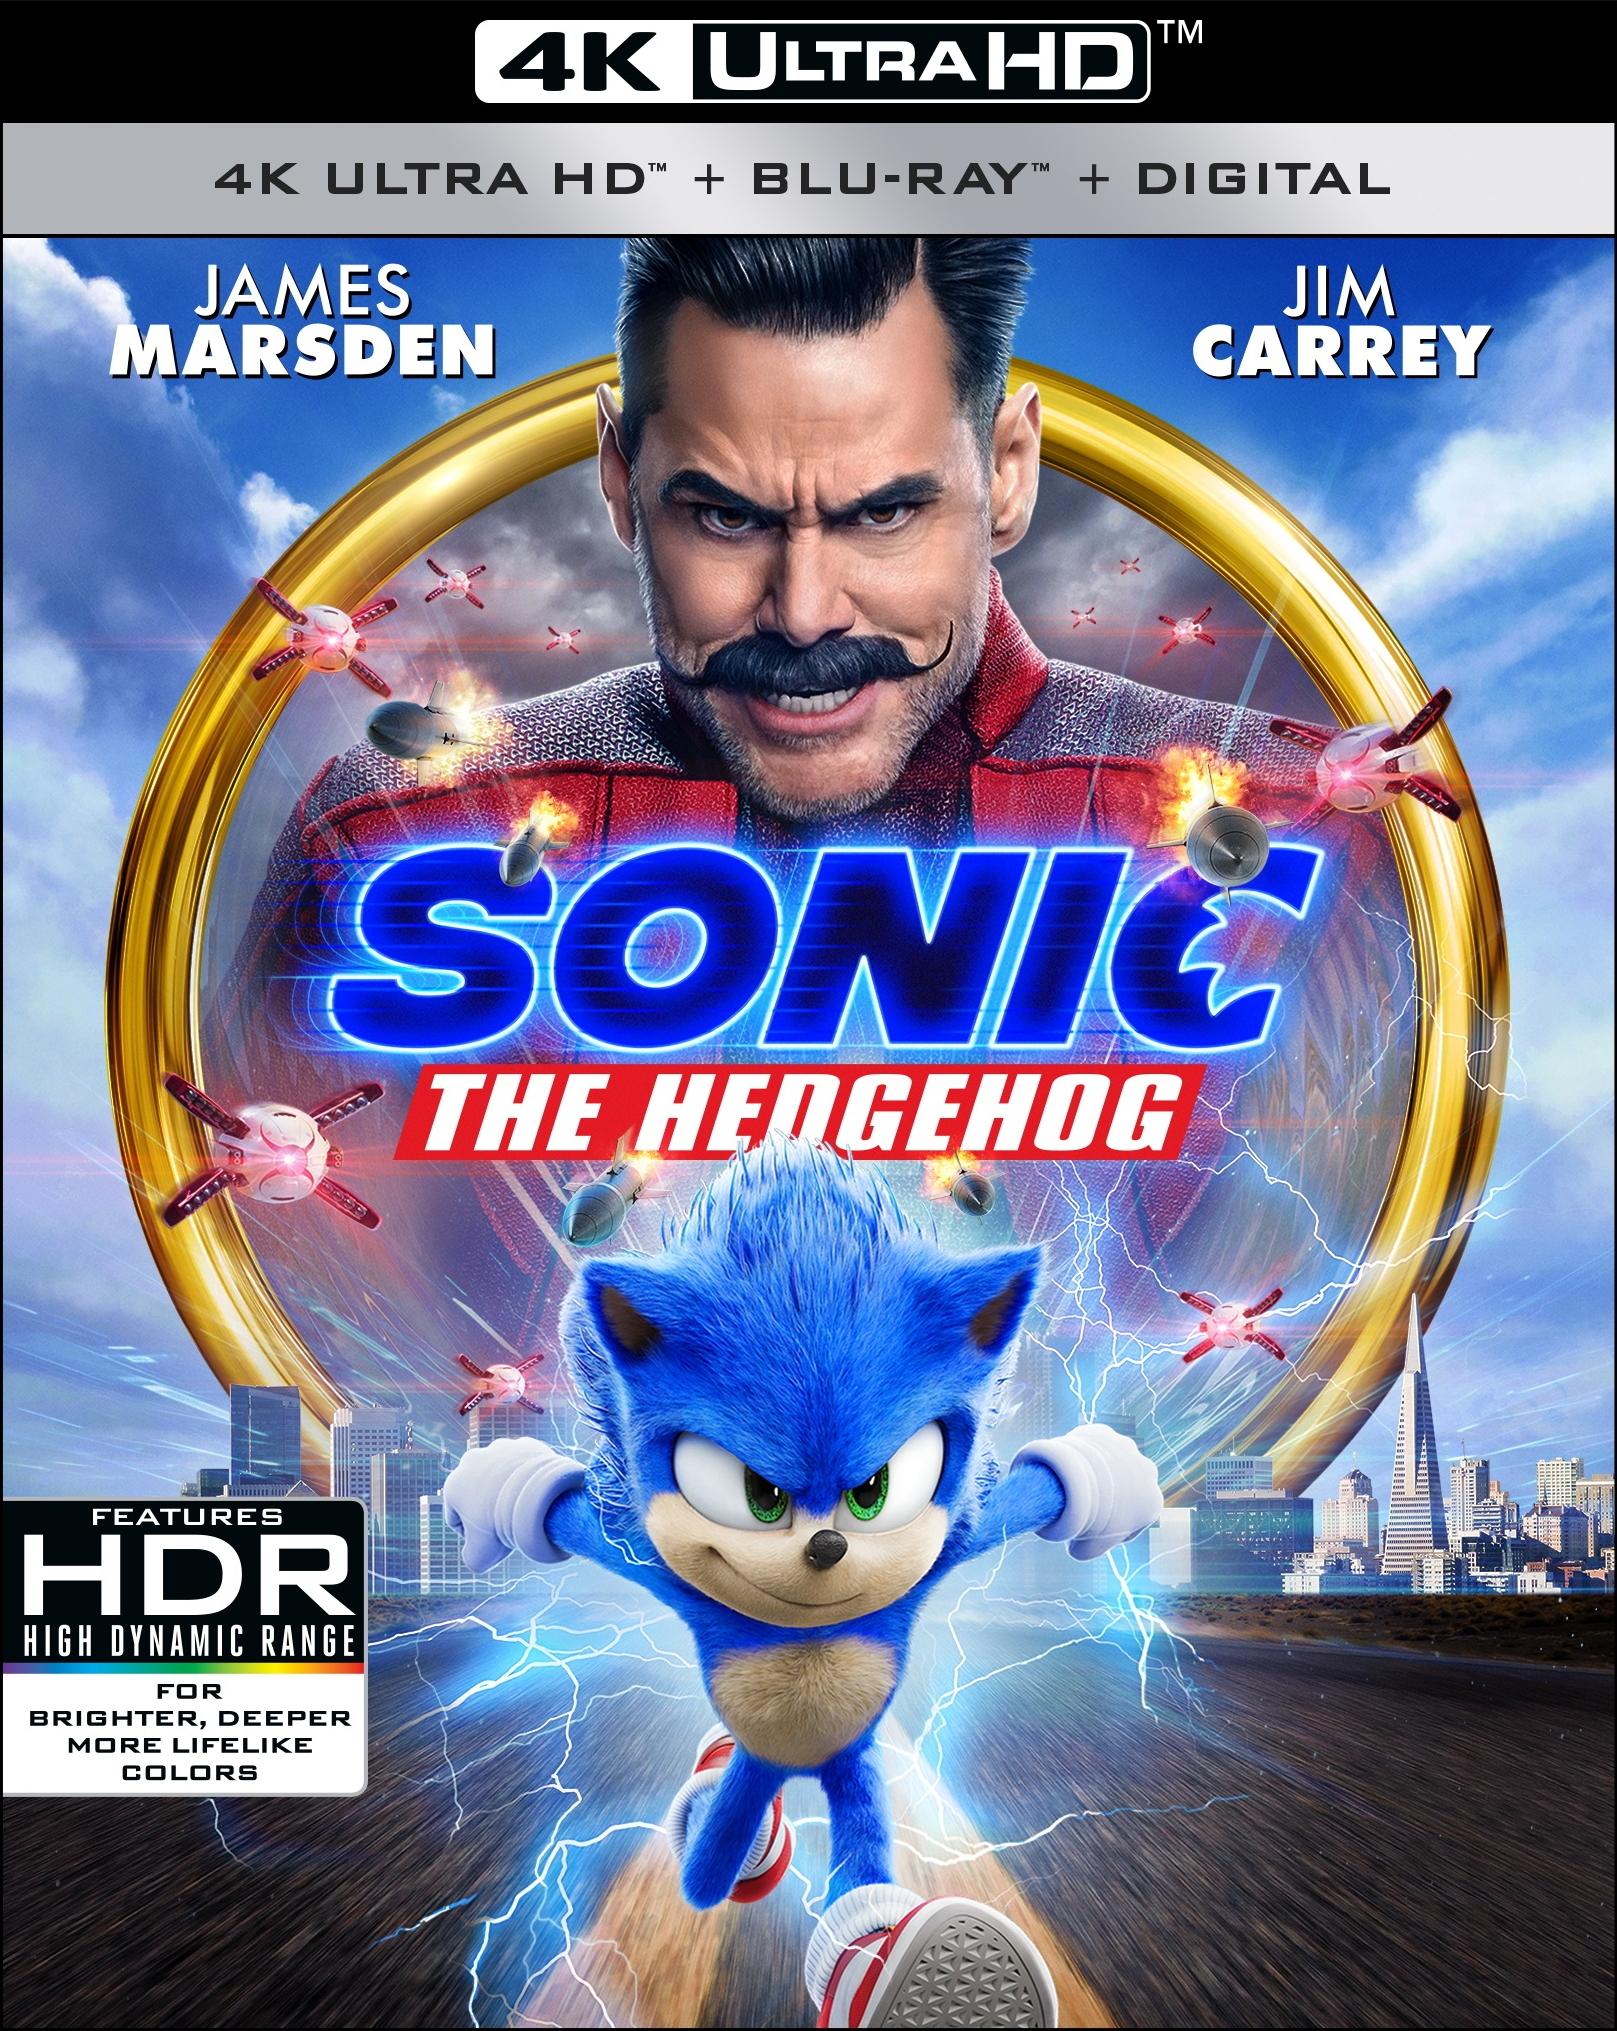 Sonic The Hedgehog Speeding To Digital Hd Early Full 4k Ultra Hd Blu Ray Dvd Details Revealed